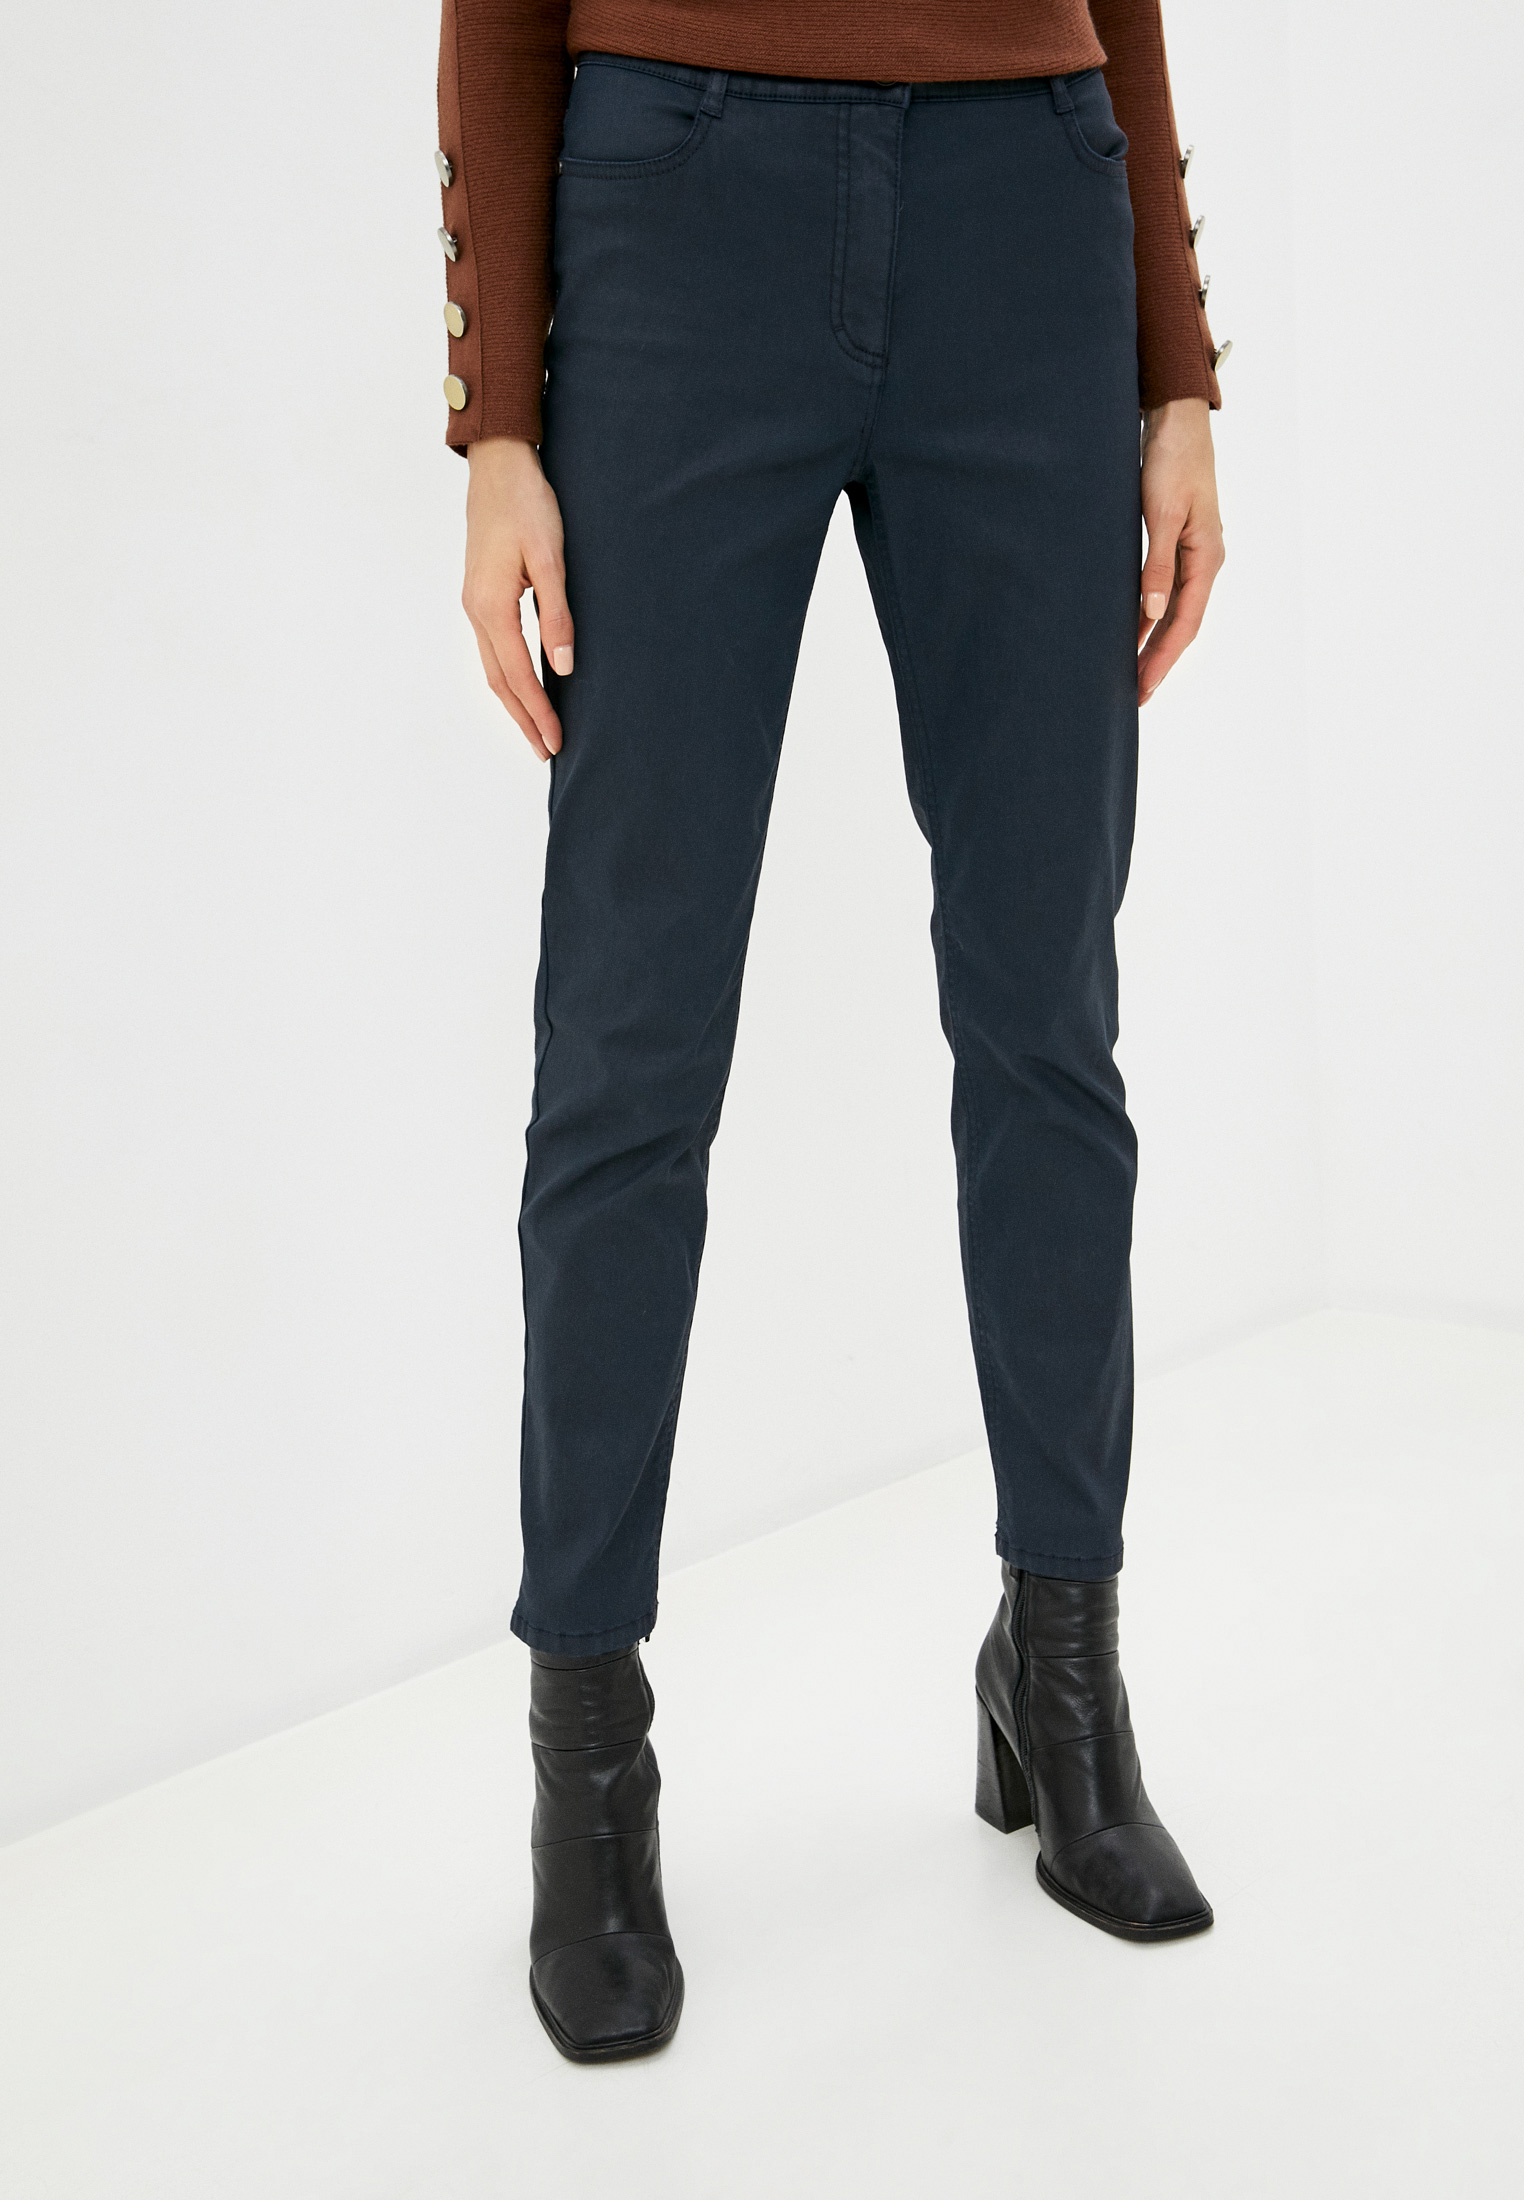 Женские прямые брюки Betty Barclay 6157/1805